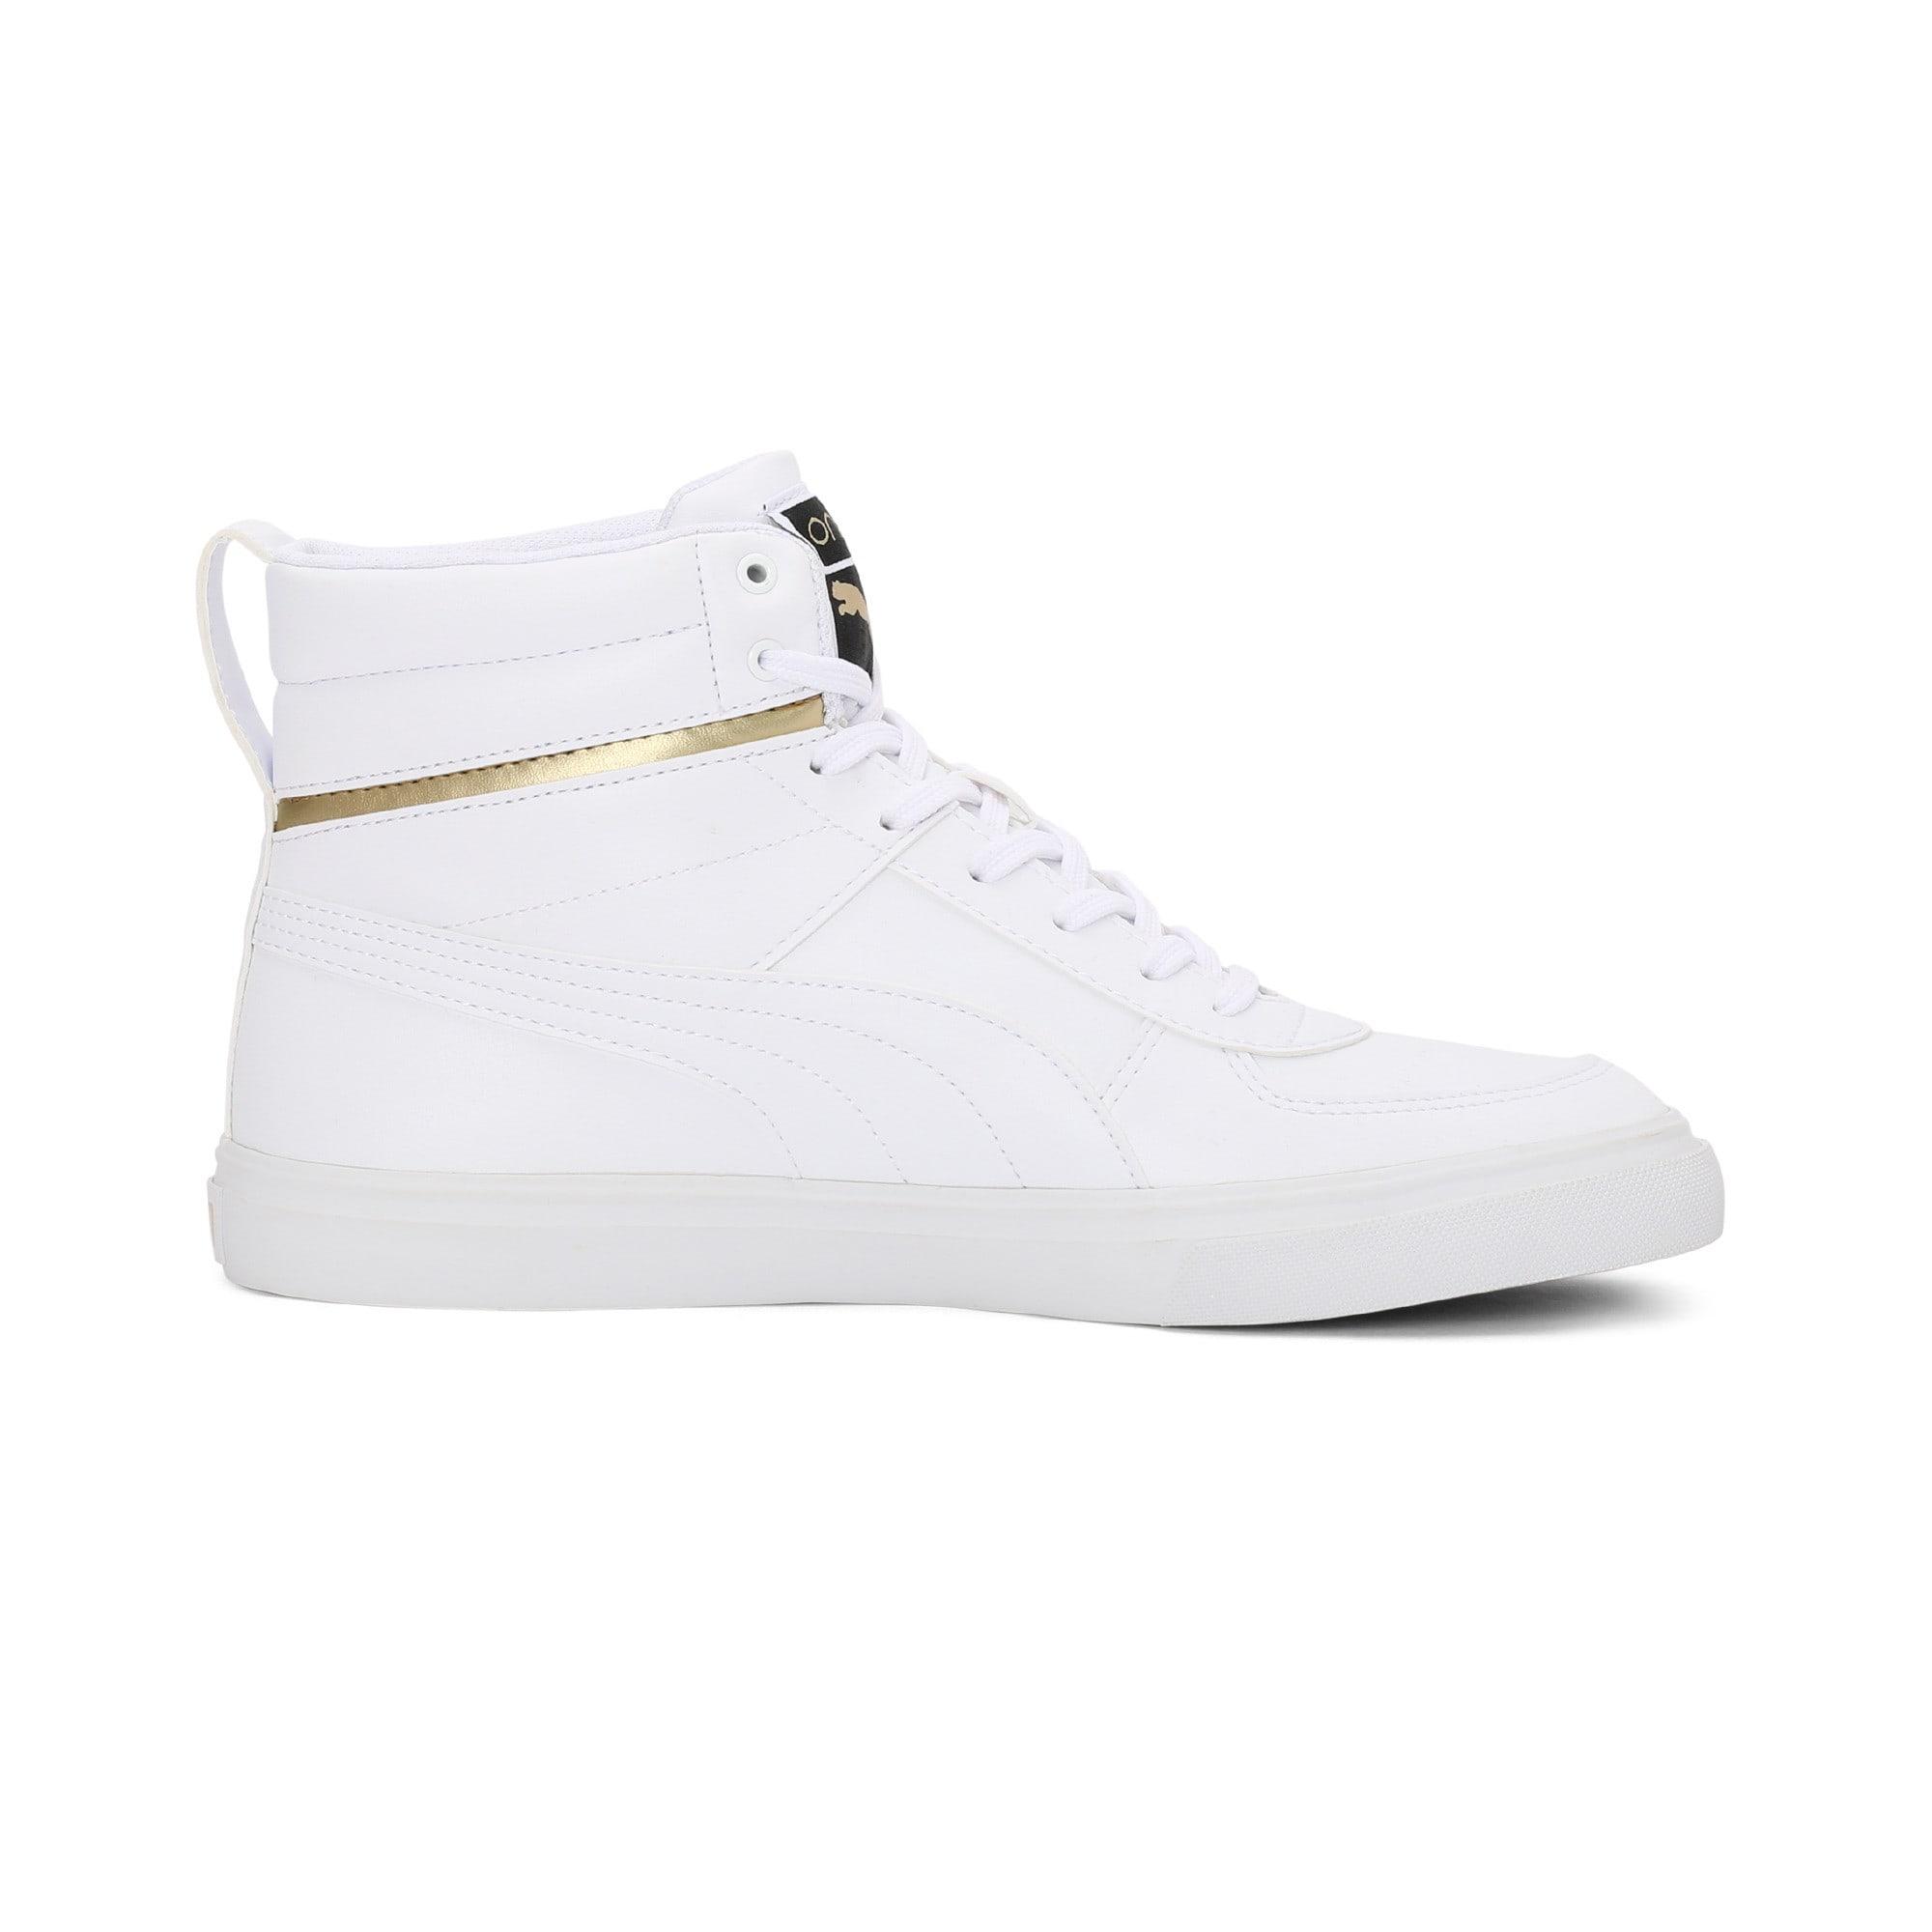 Thumbnail 5 of one8 Mid Men's Sneakers, Puma White-Puma Team Gold, medium-IND